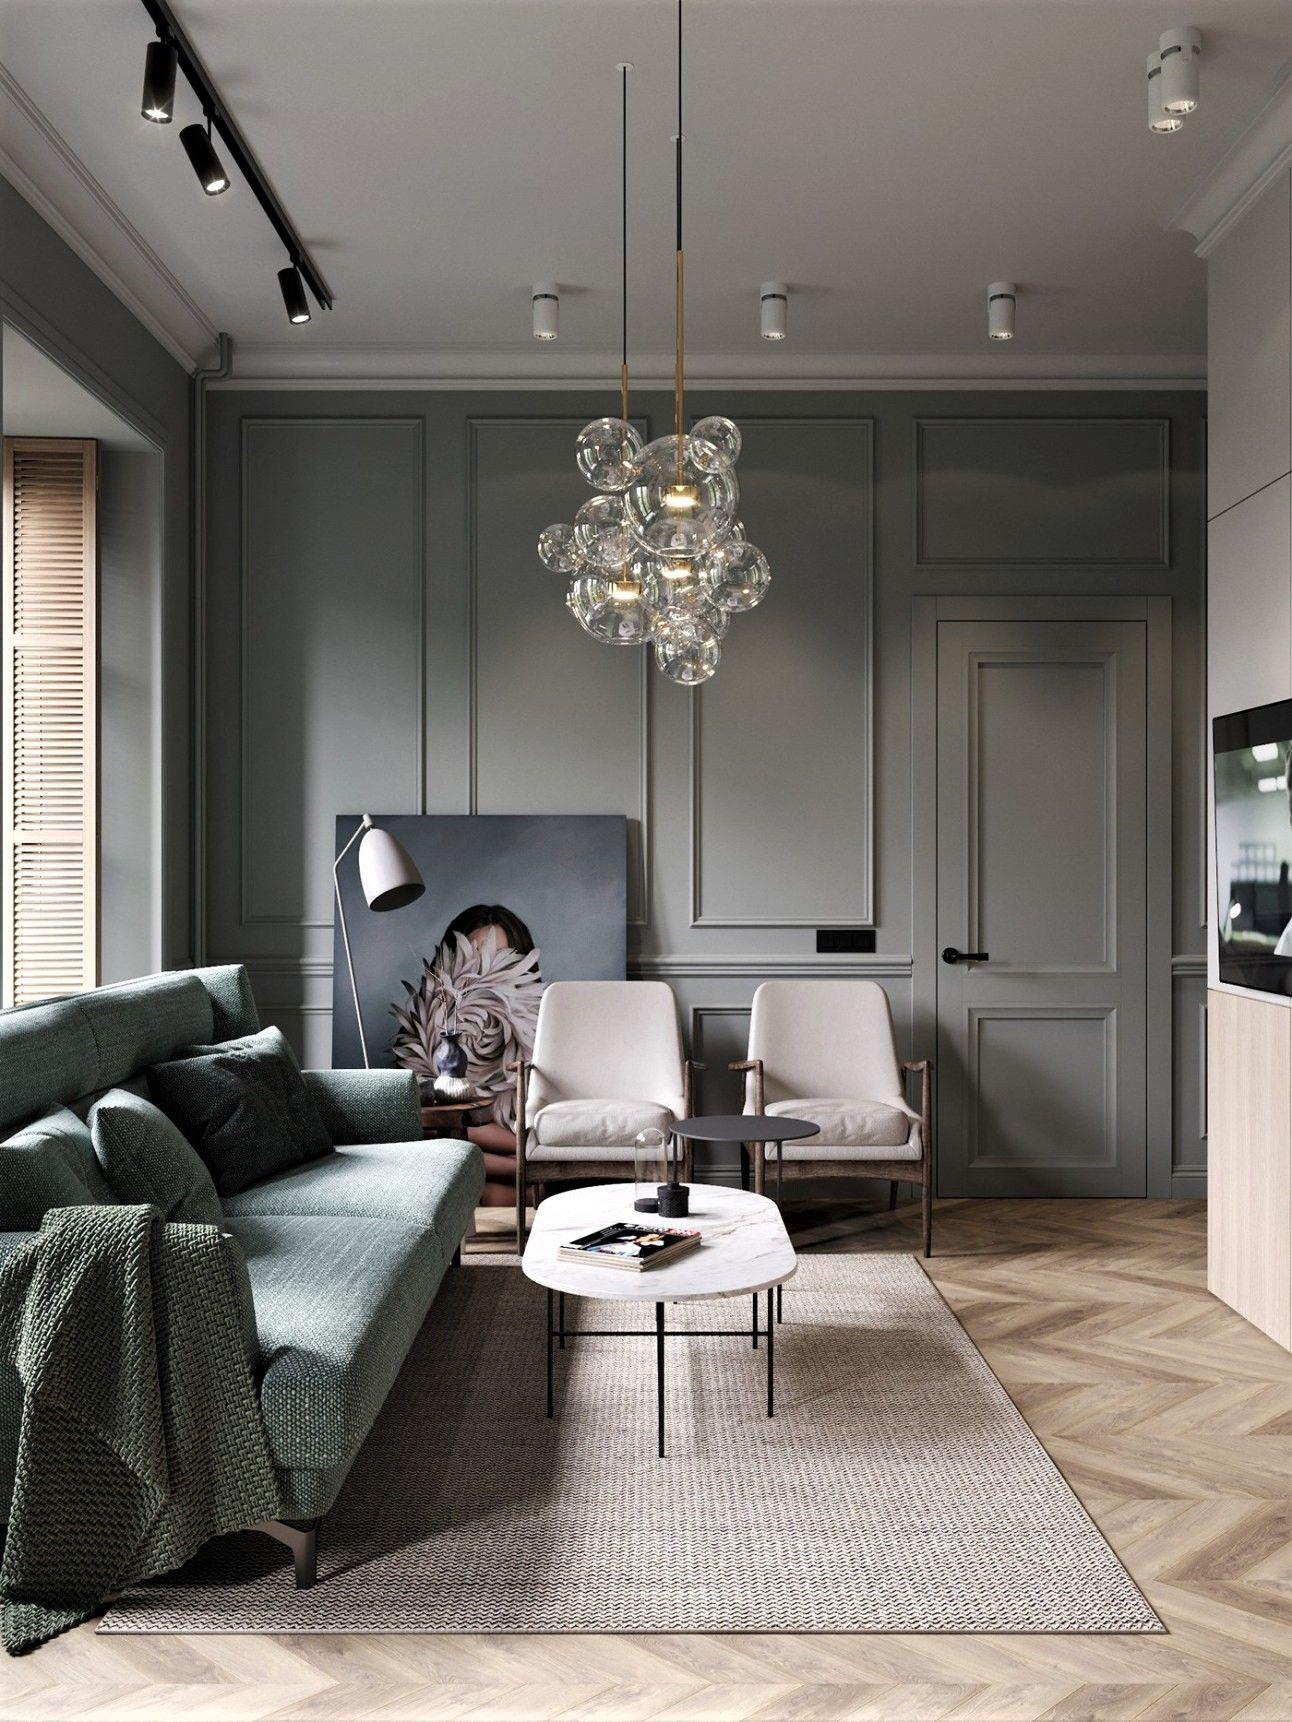 Beautiful Chic Apartment In Saint Petersburg By Cartelle Design The Man Interiordesign Interior Ho Apartment